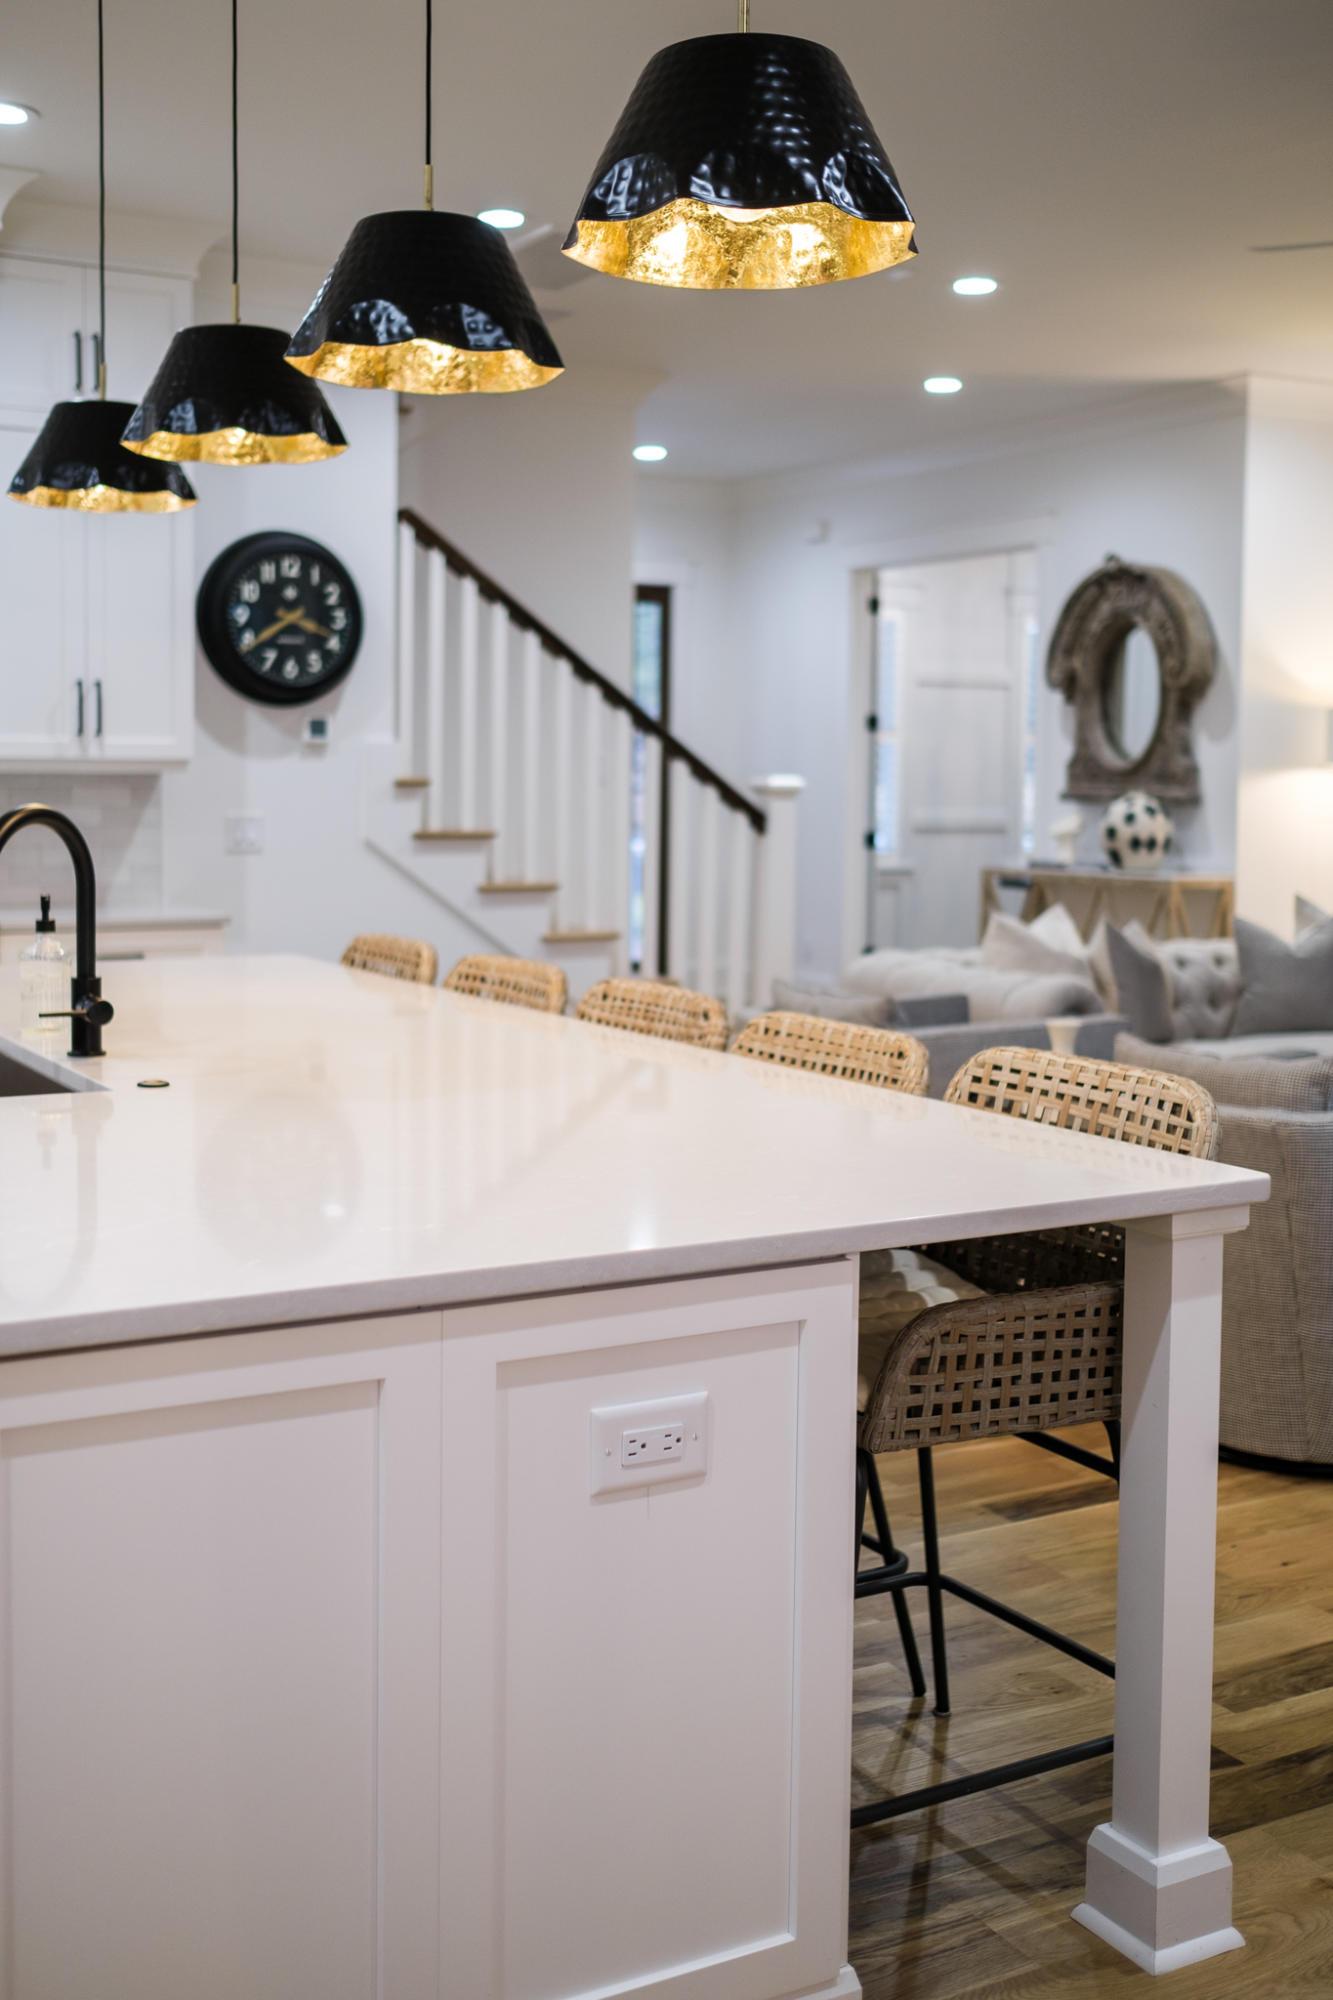 Daniel Island Park Homes For Sale - 208 Brailsford, Charleston, SC - 32